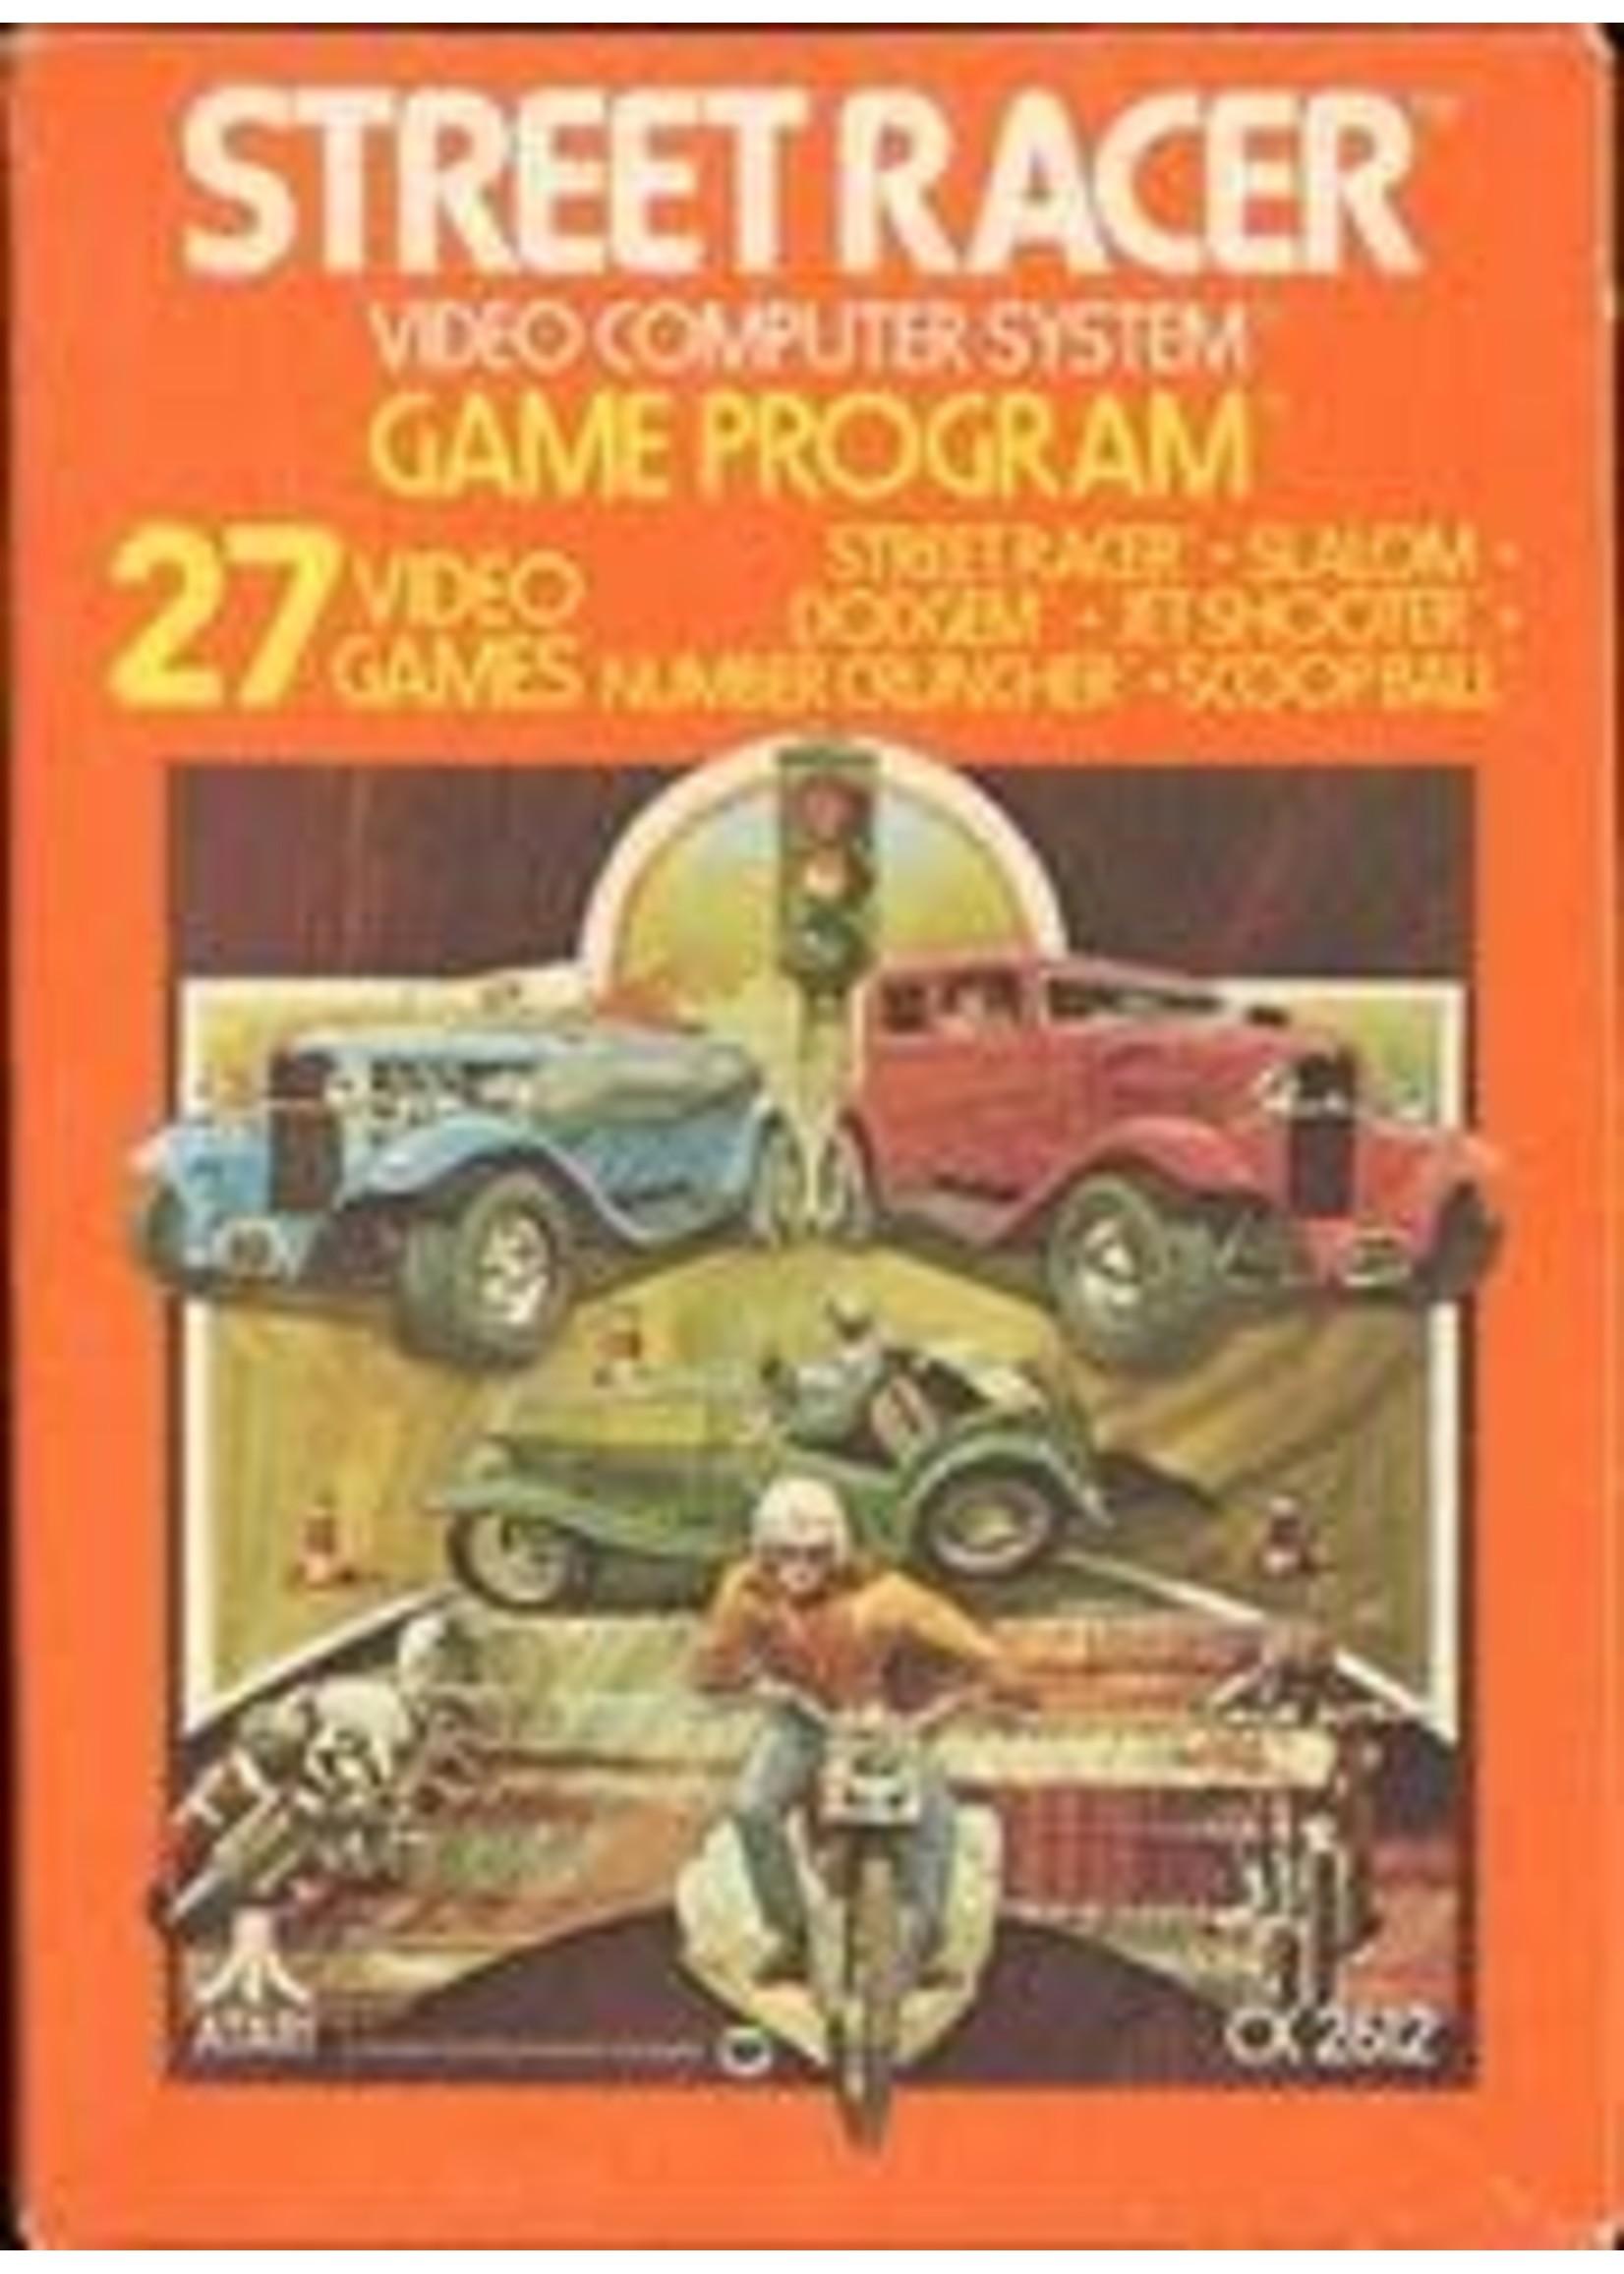 Street Racer Atari 2600